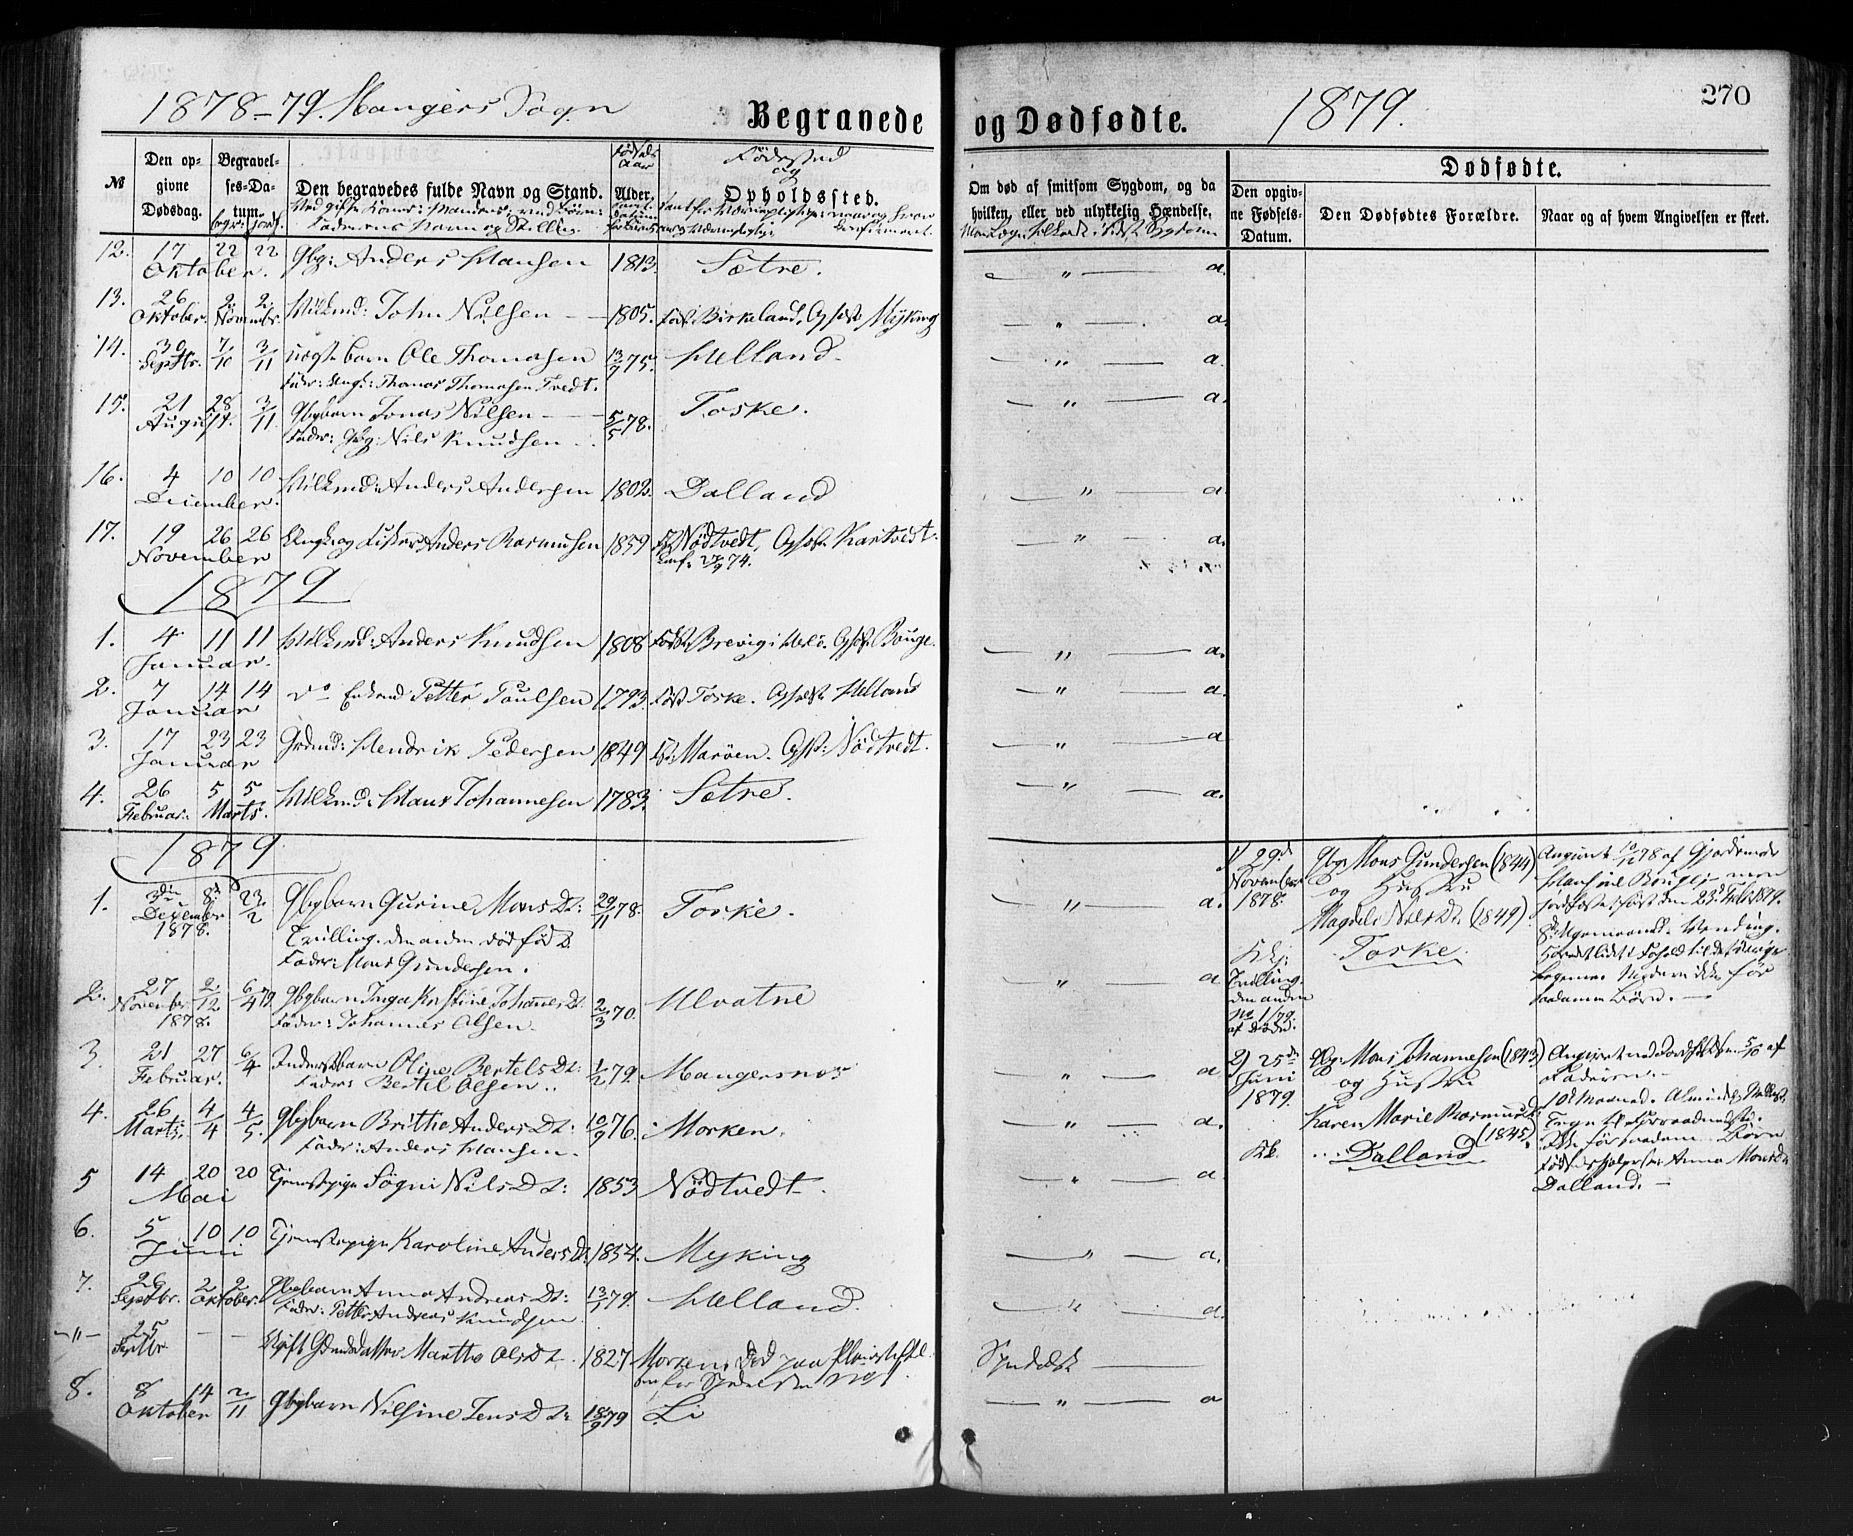 SAB, Manger sokneprestembete, H/Haa: Ministerialbok nr. A 8, 1871-1880, s. 270